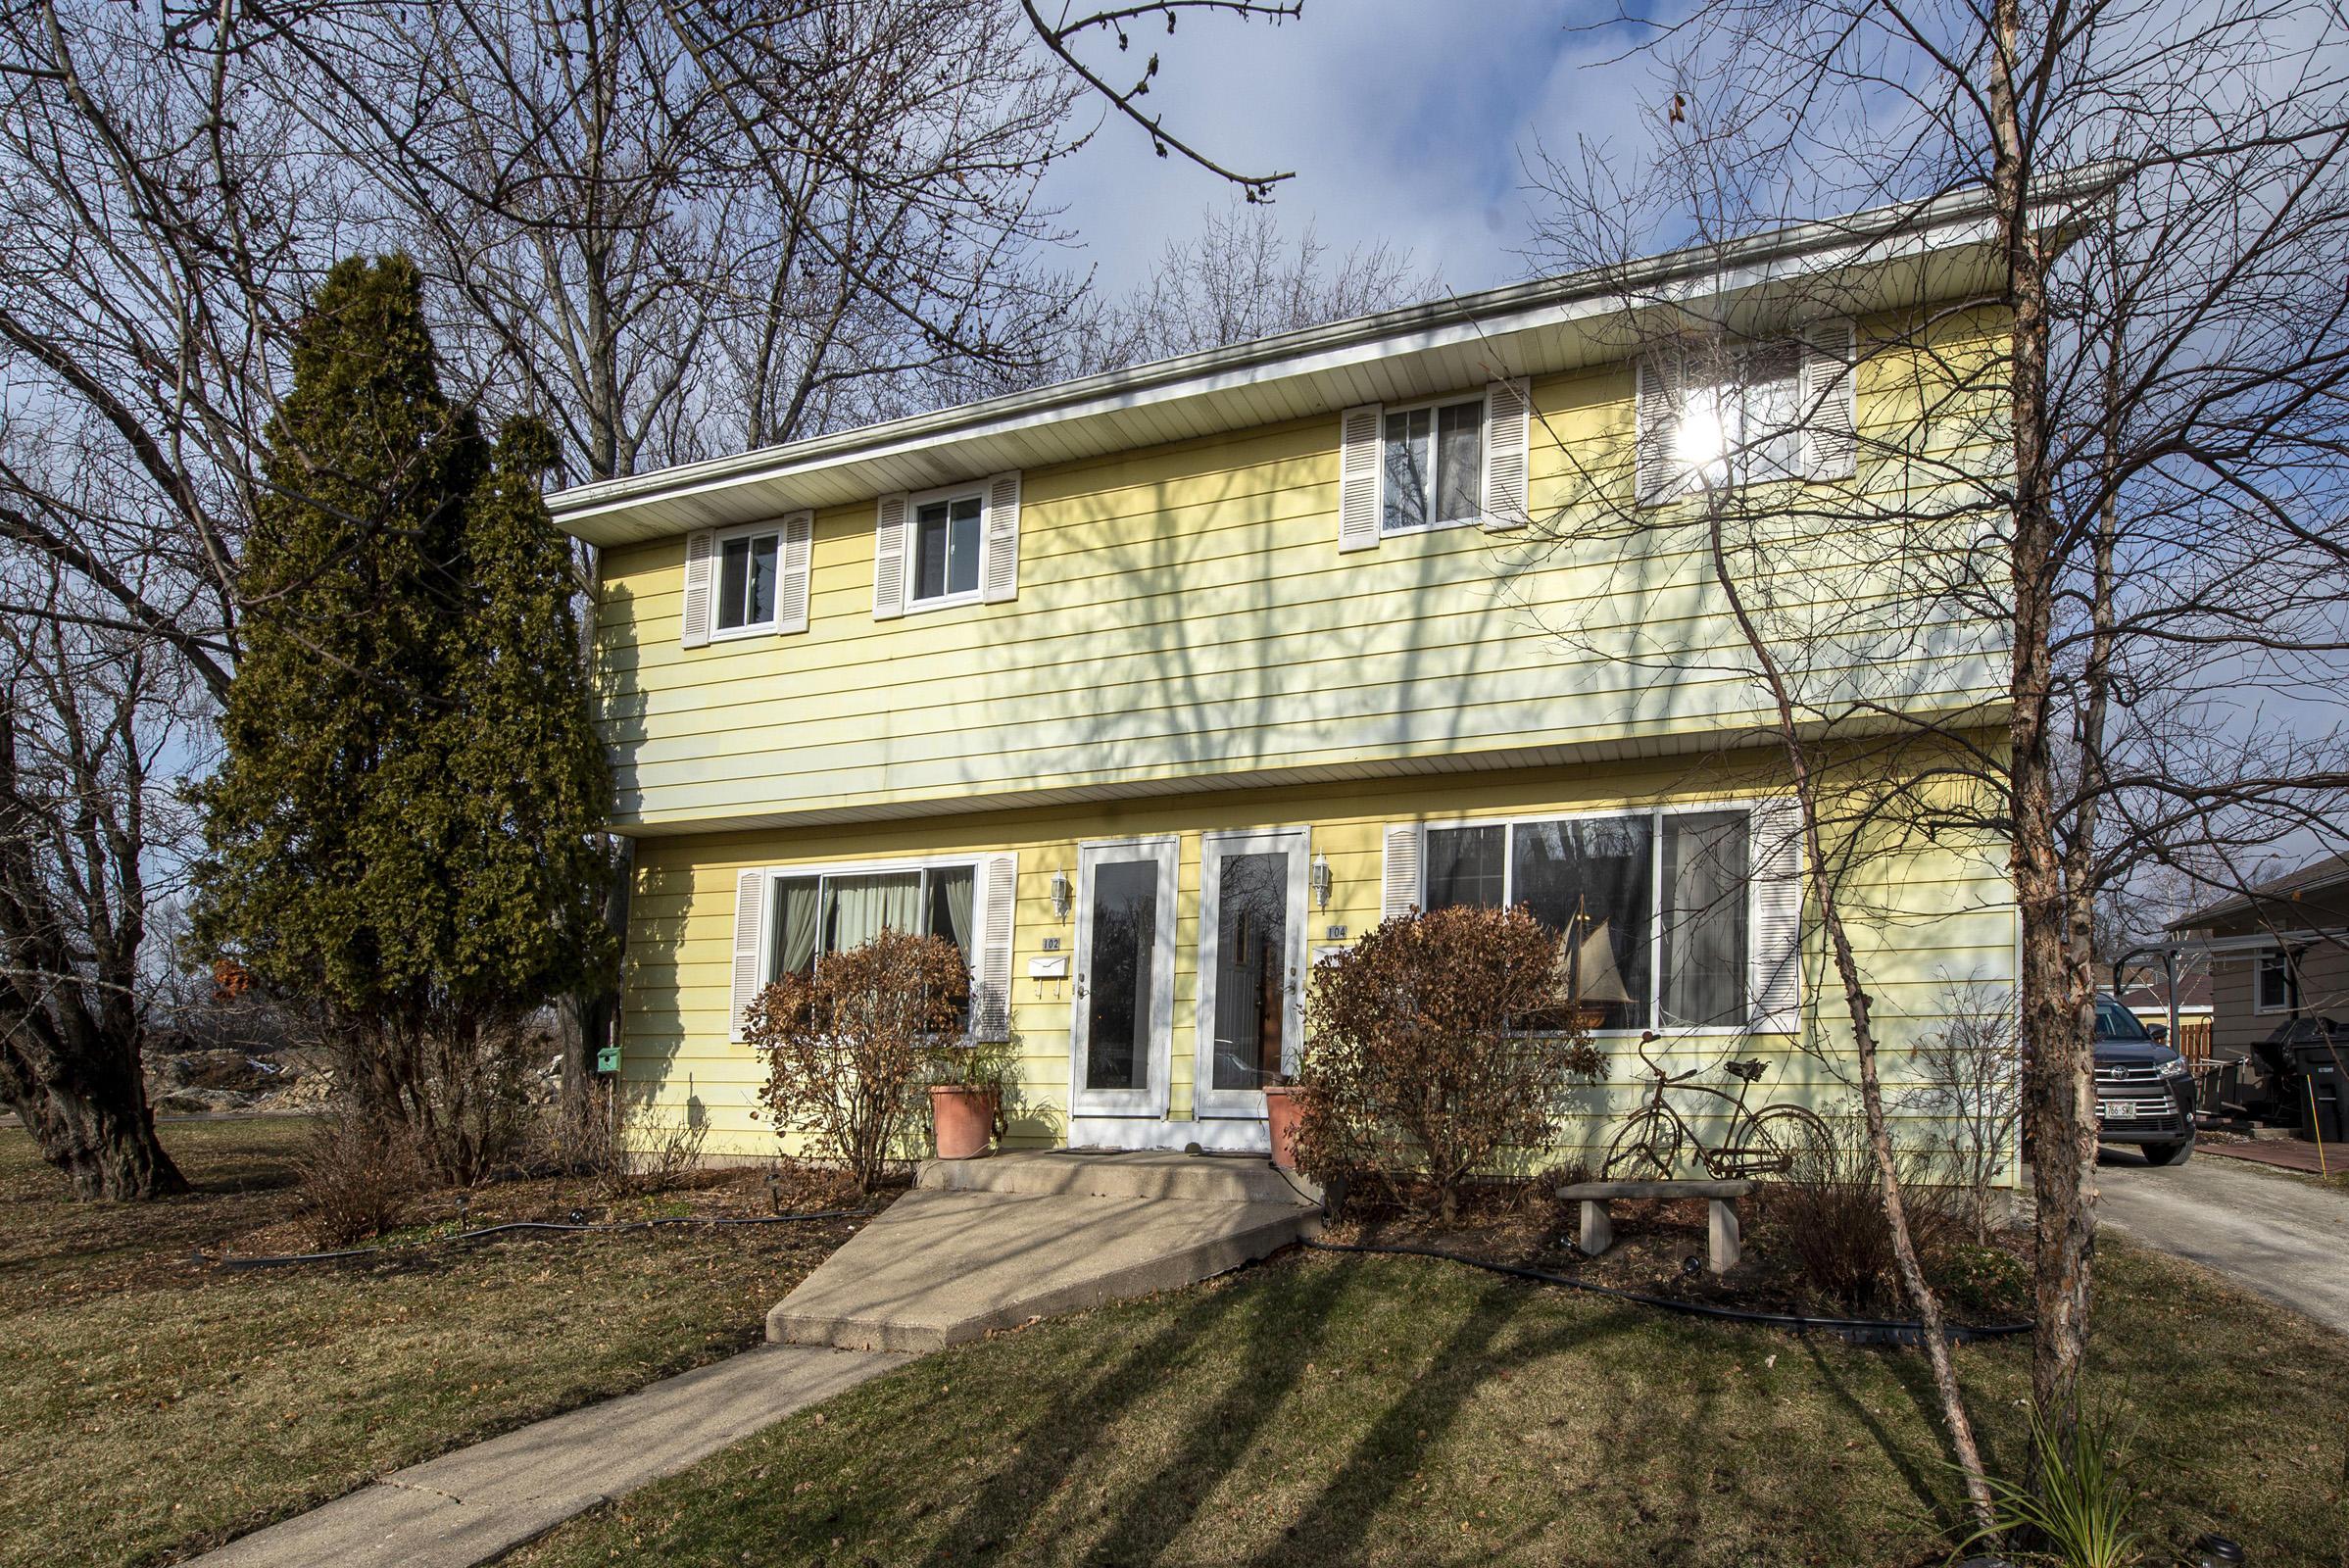 102 Marcella St, Oconomowoc, Wisconsin 53066, 3 Bedrooms Bedrooms, 5 Rooms Rooms,1 BathroomBathrooms,Two-Family,For Sale,Marcella St,1,1722184